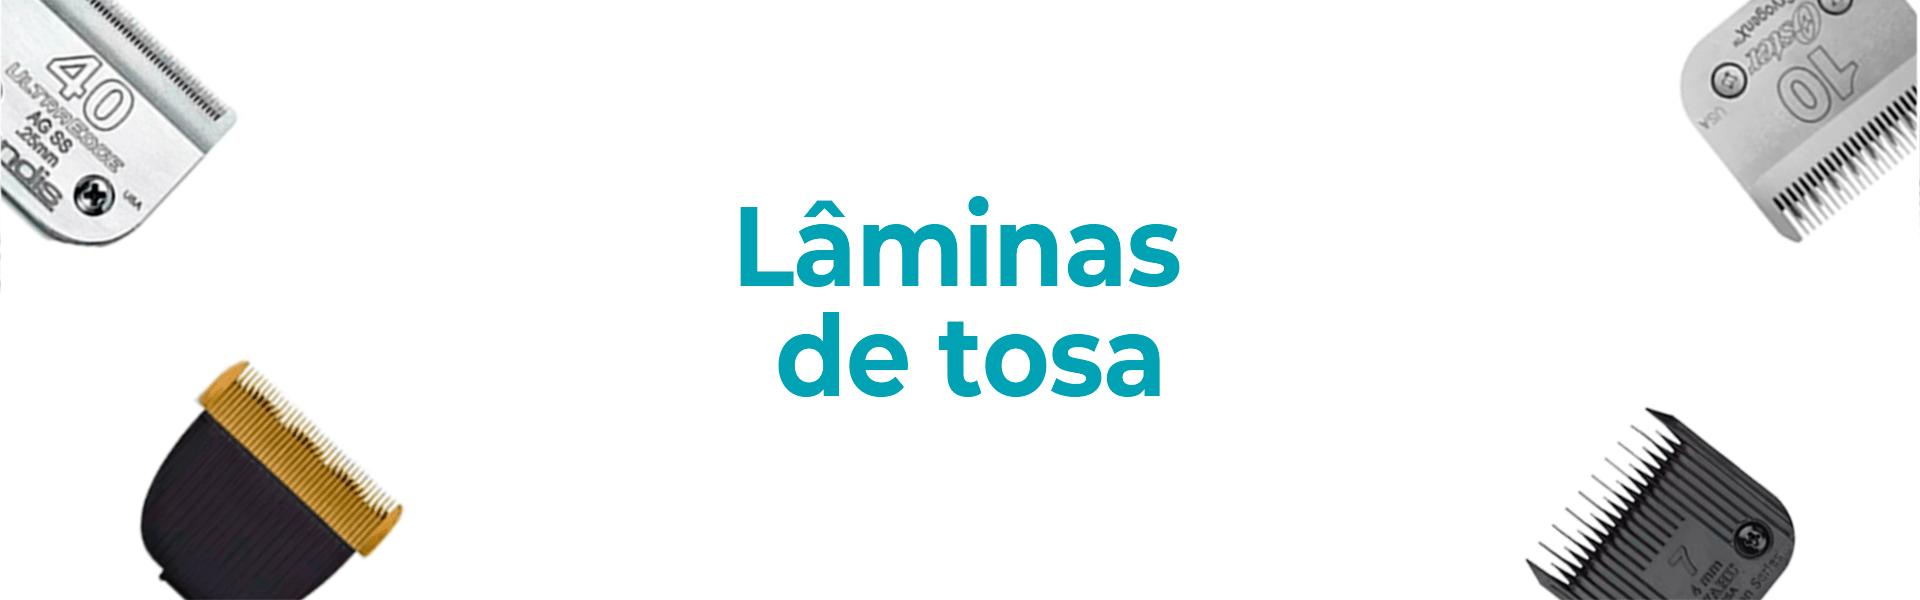 Laminas - categoria @Desktop